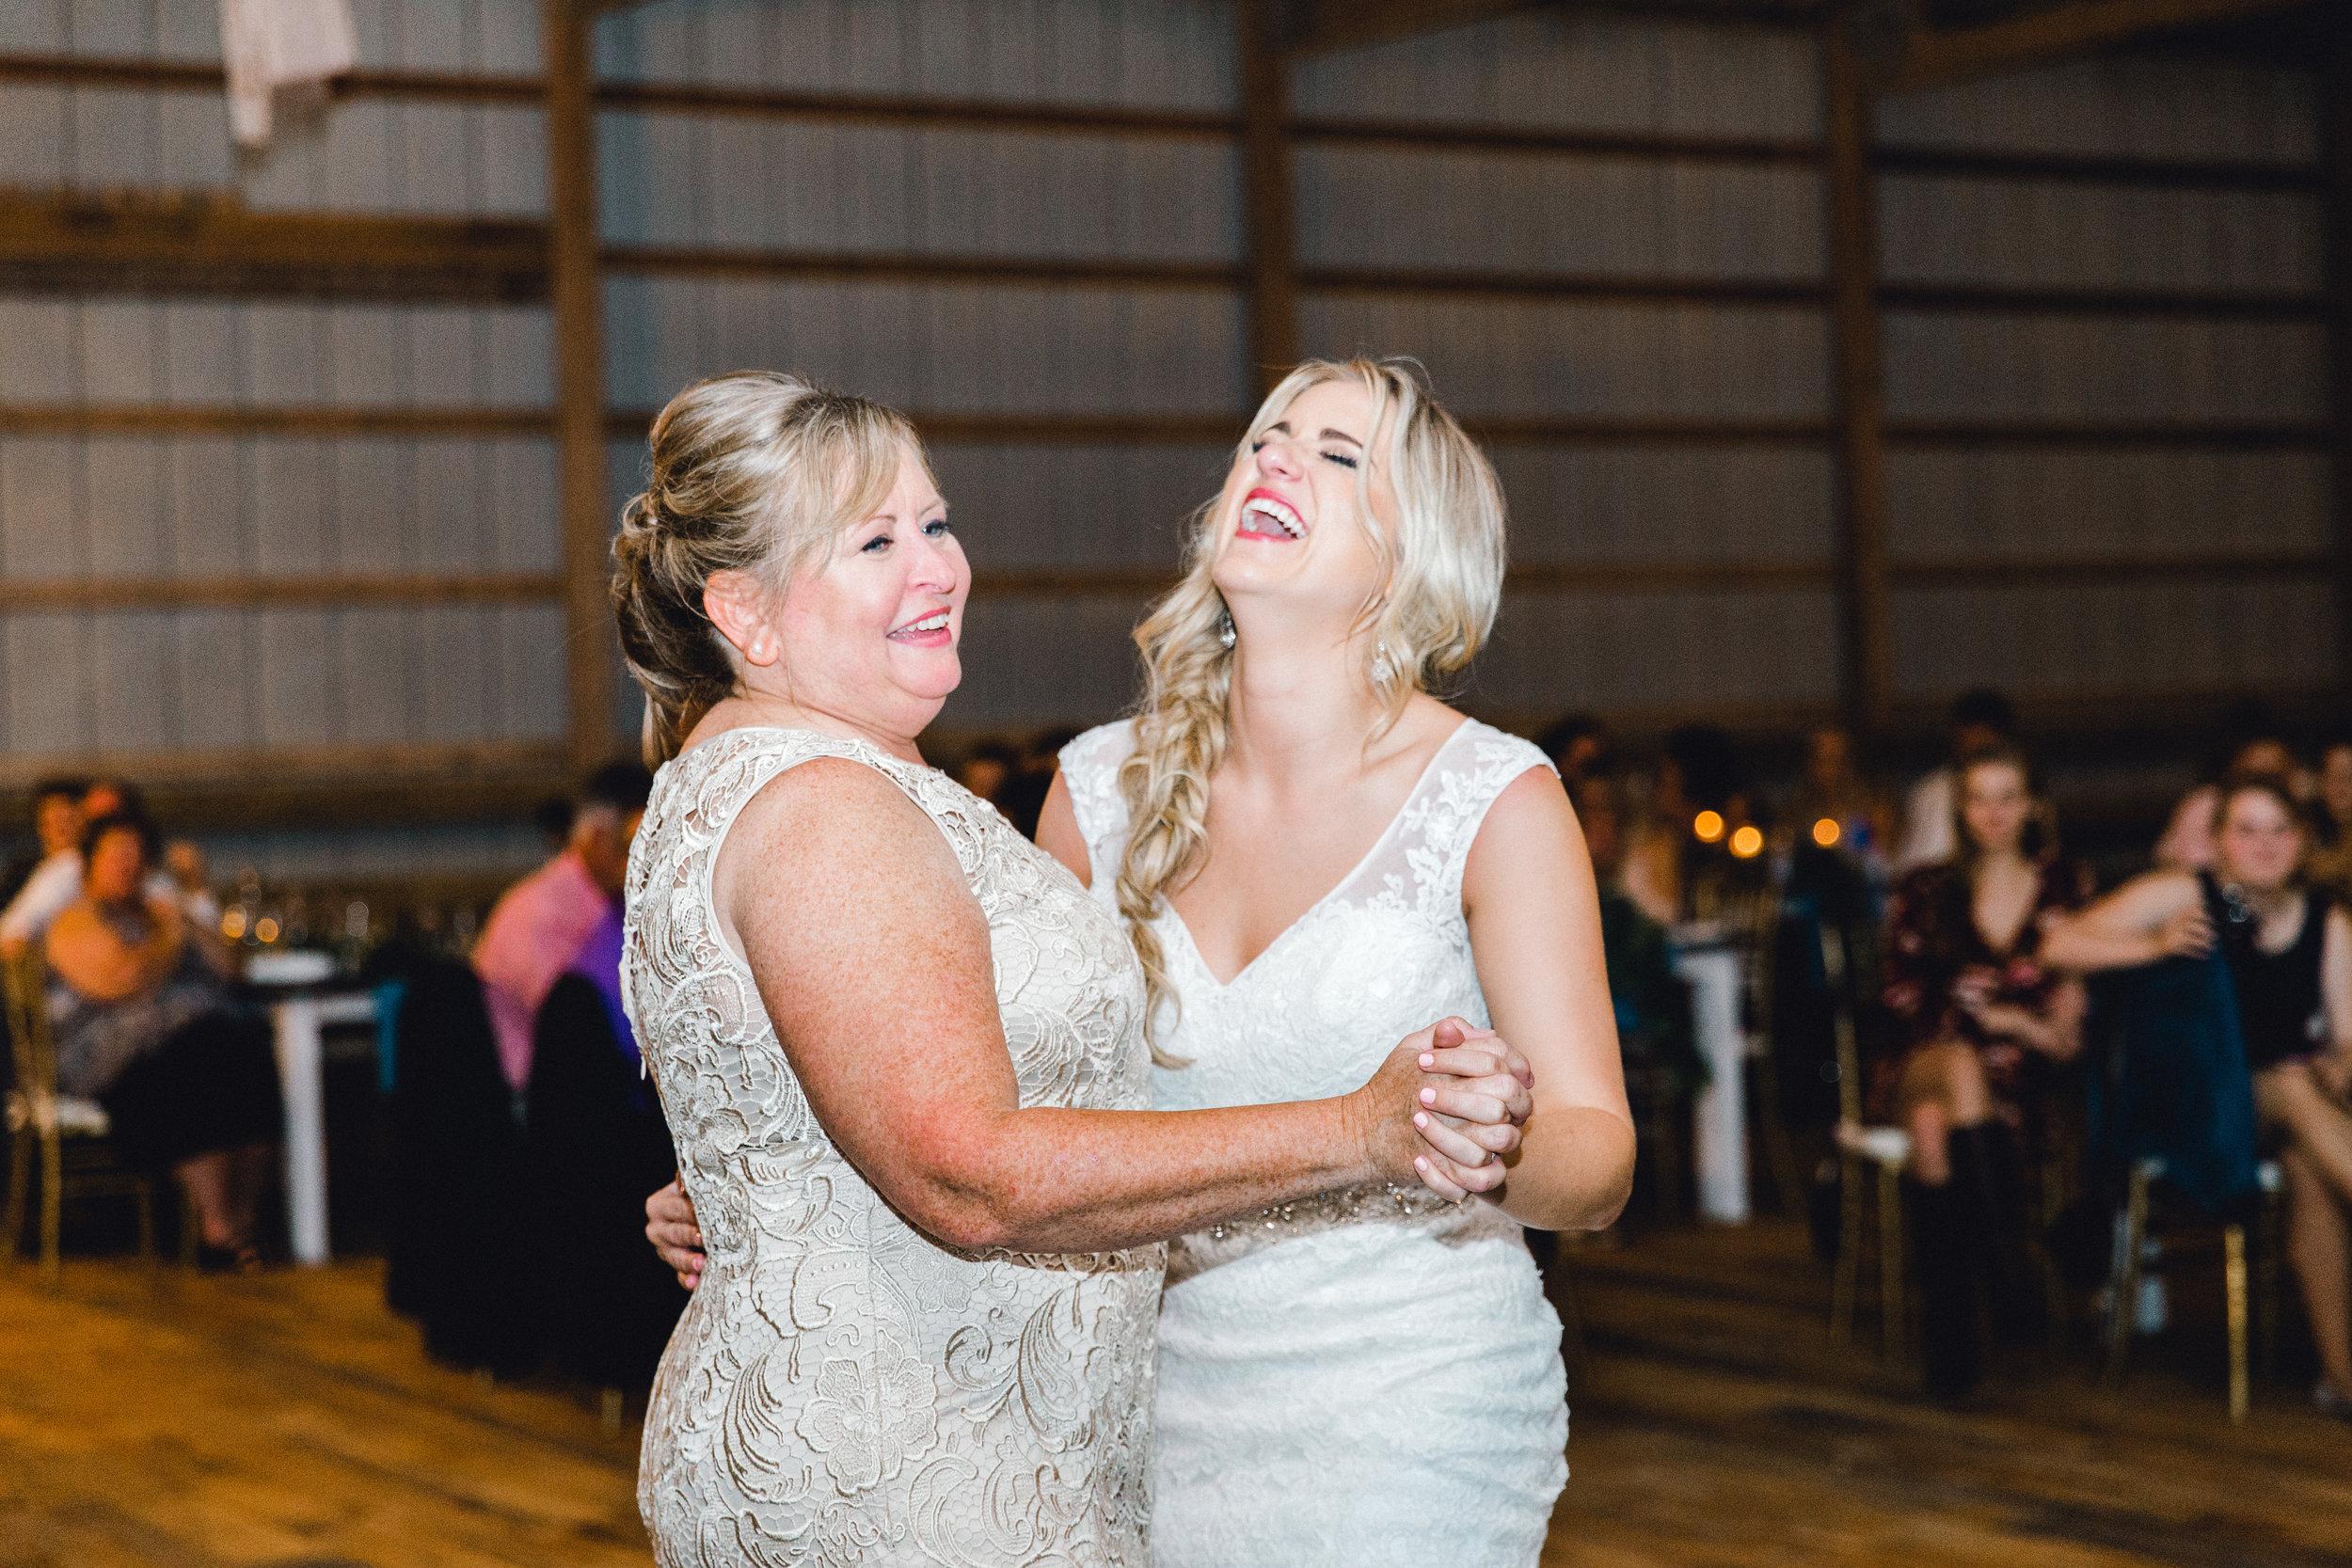 Paige-Mercer-Photography-Florida-Wedding-Photographer-Alyssa&Drew-87.jpg